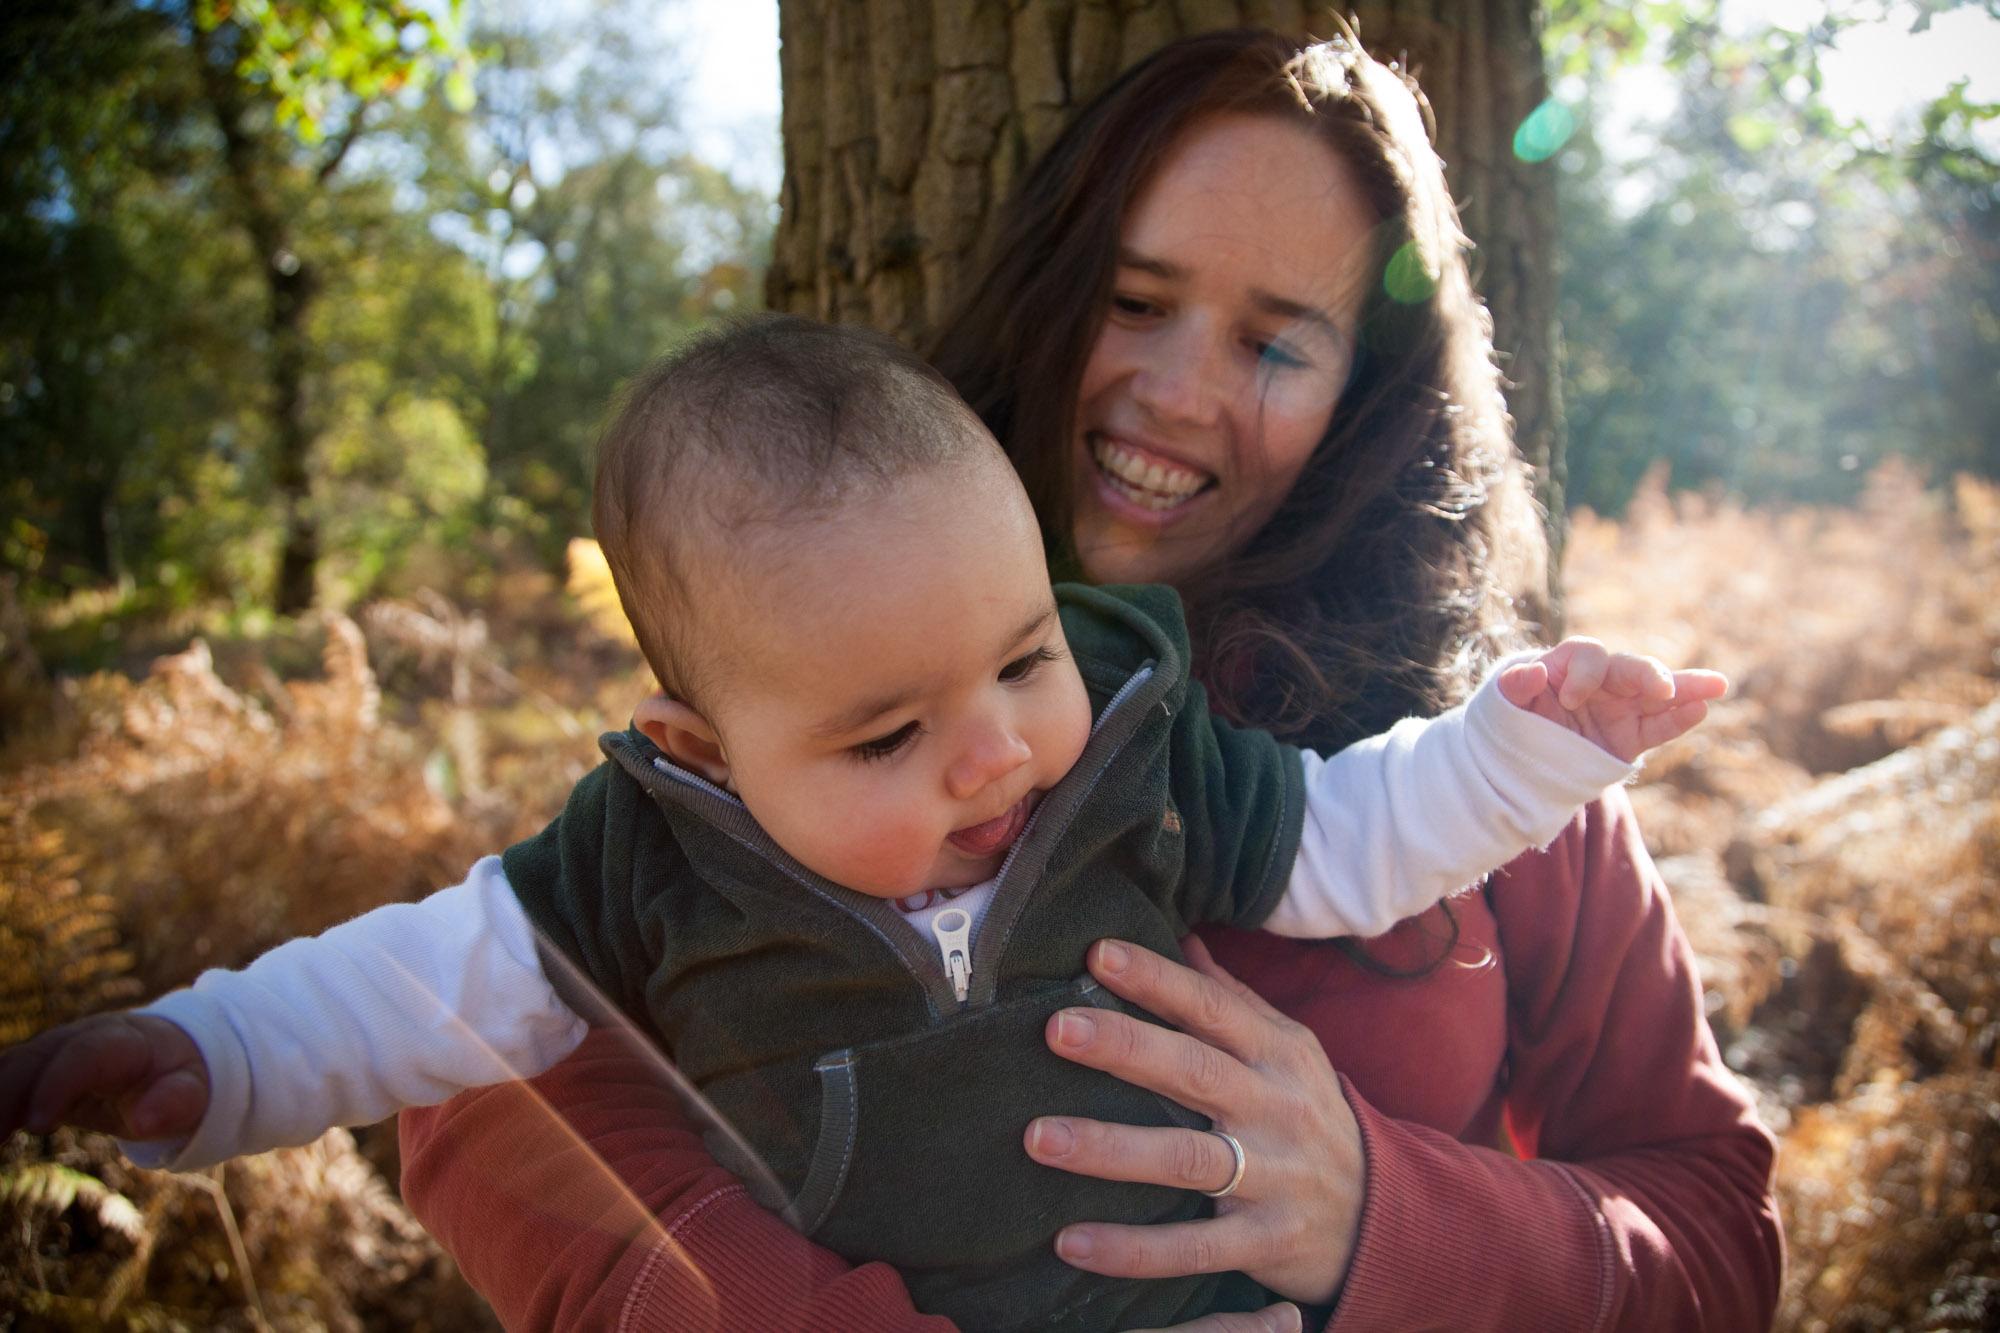 family-life-family-photographer-oxford-london-jonathan-self-photography-28.jpg